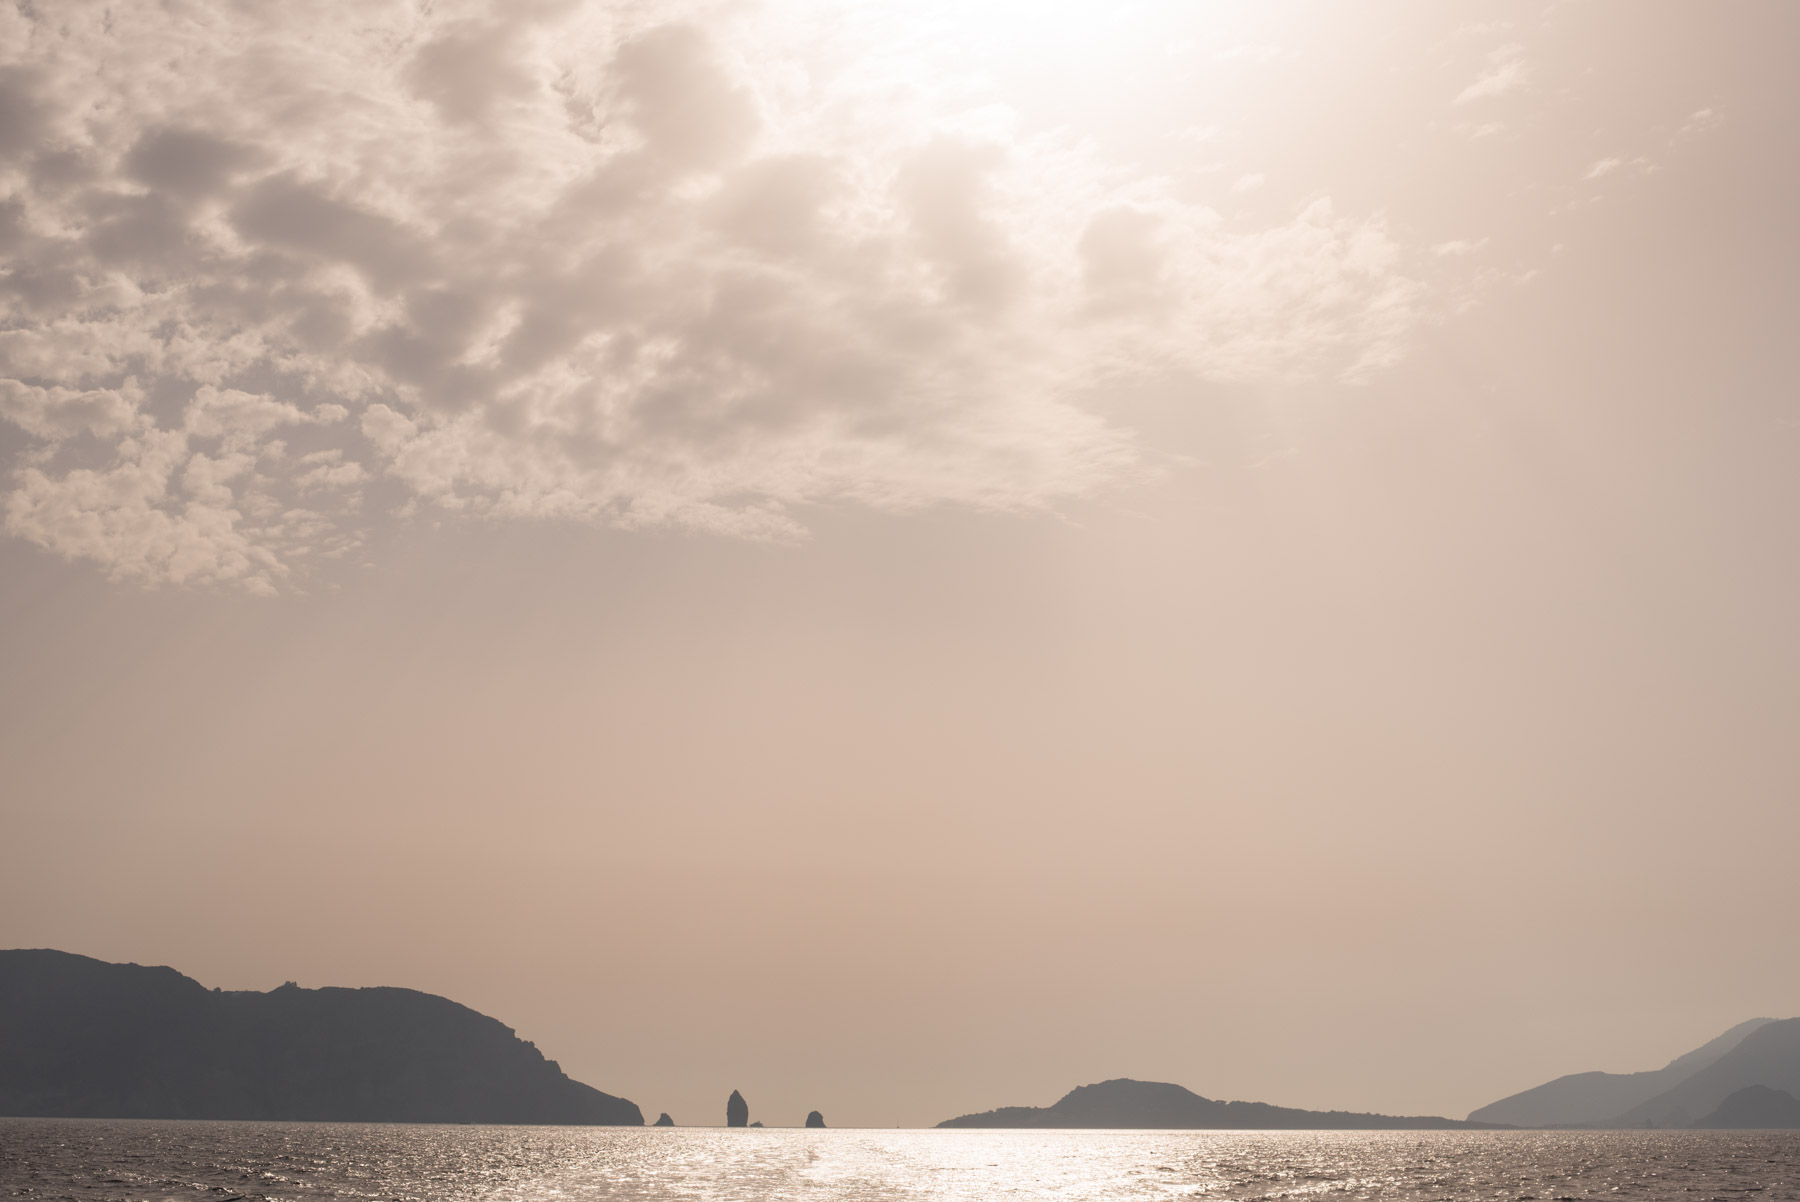 Sunset over lipari, salina, vulcano, stromboli, alicudi, filicudi, panarea, the small aeolian islands